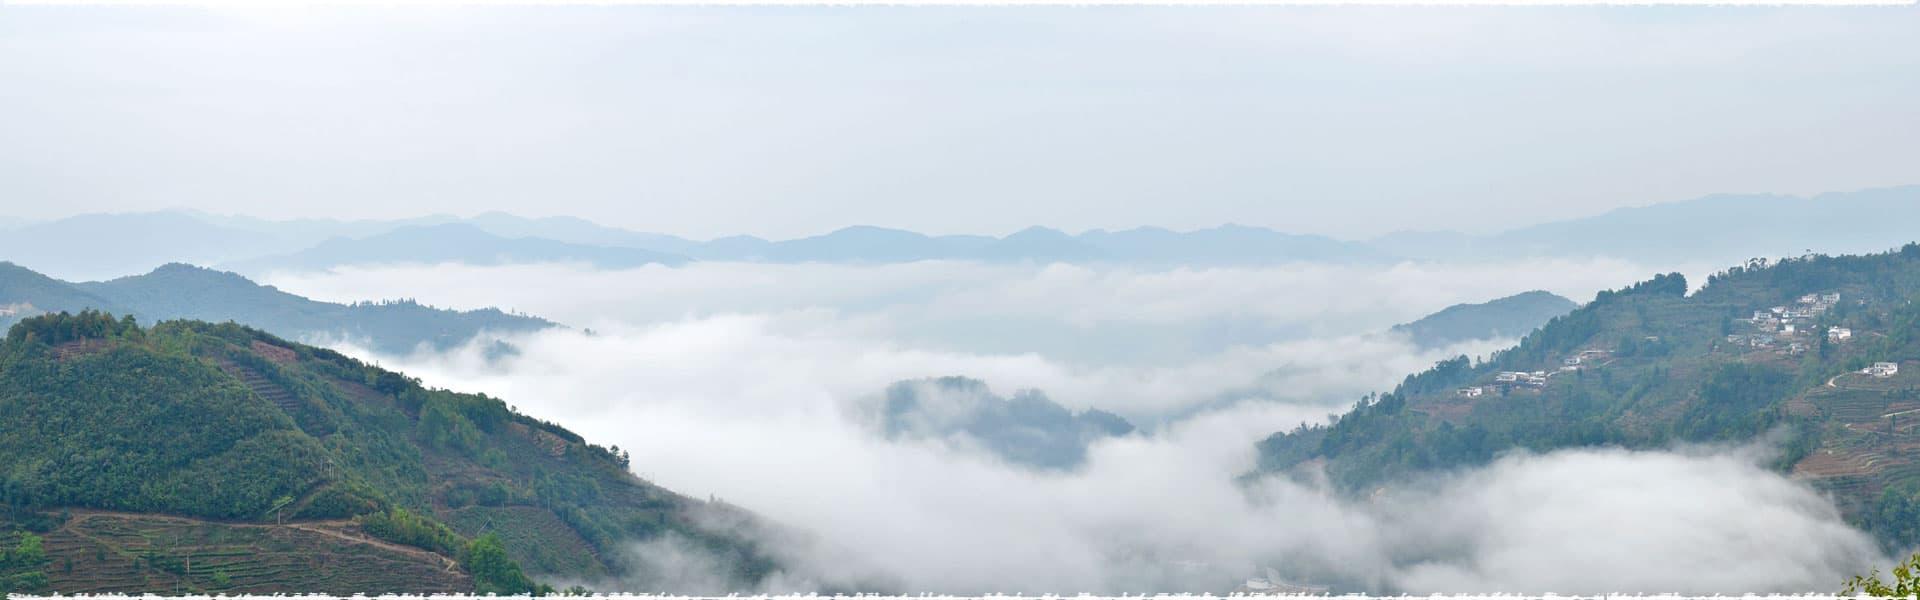 Dreamland – Yunnan, Fengqing (Part 2)